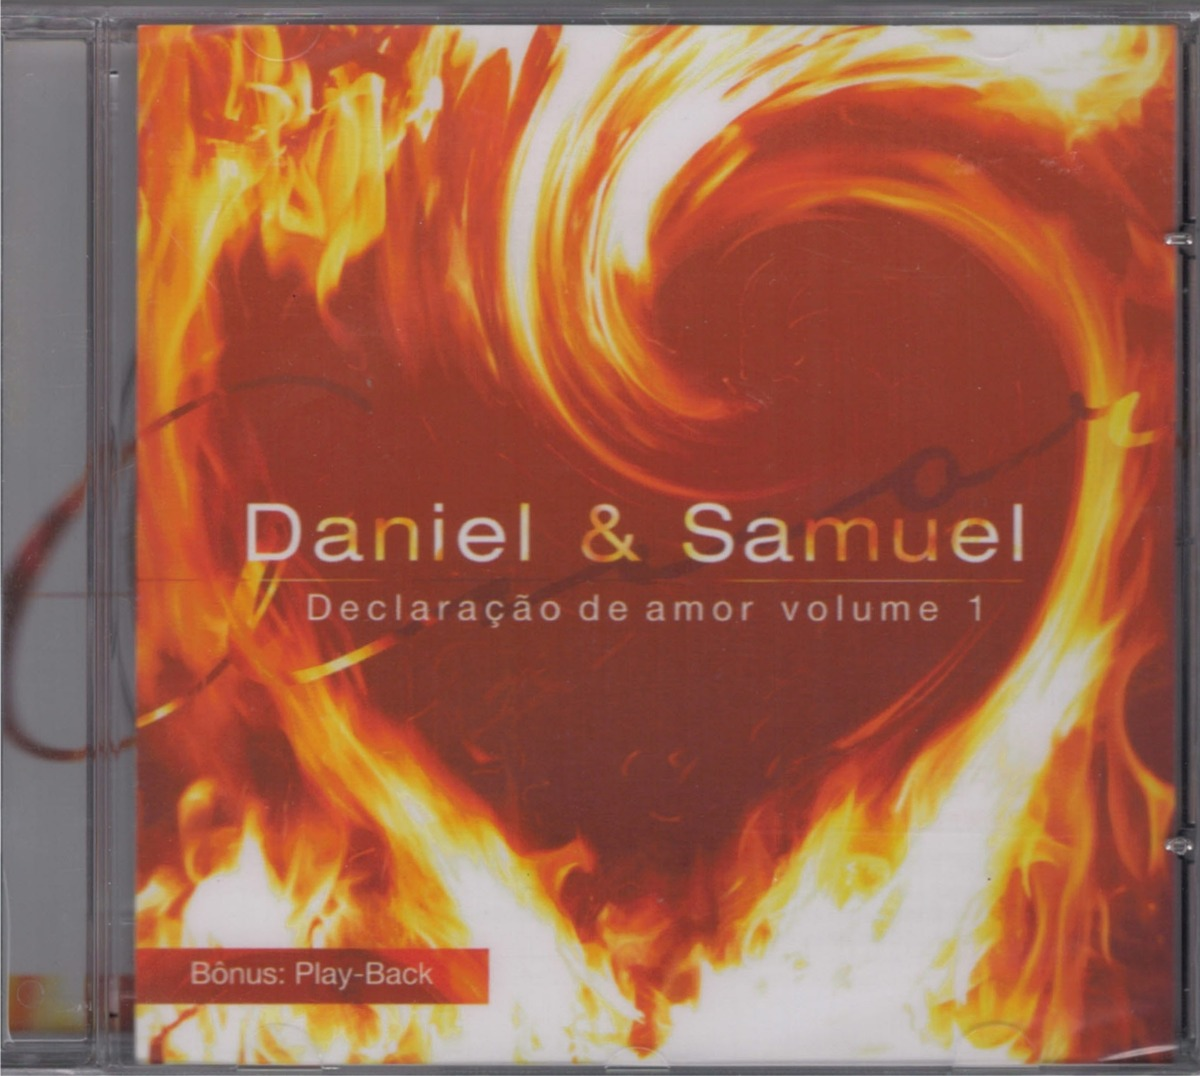 Cd Daniel E Samuel Declaracao De Amor 1 Bonus Playback R 12